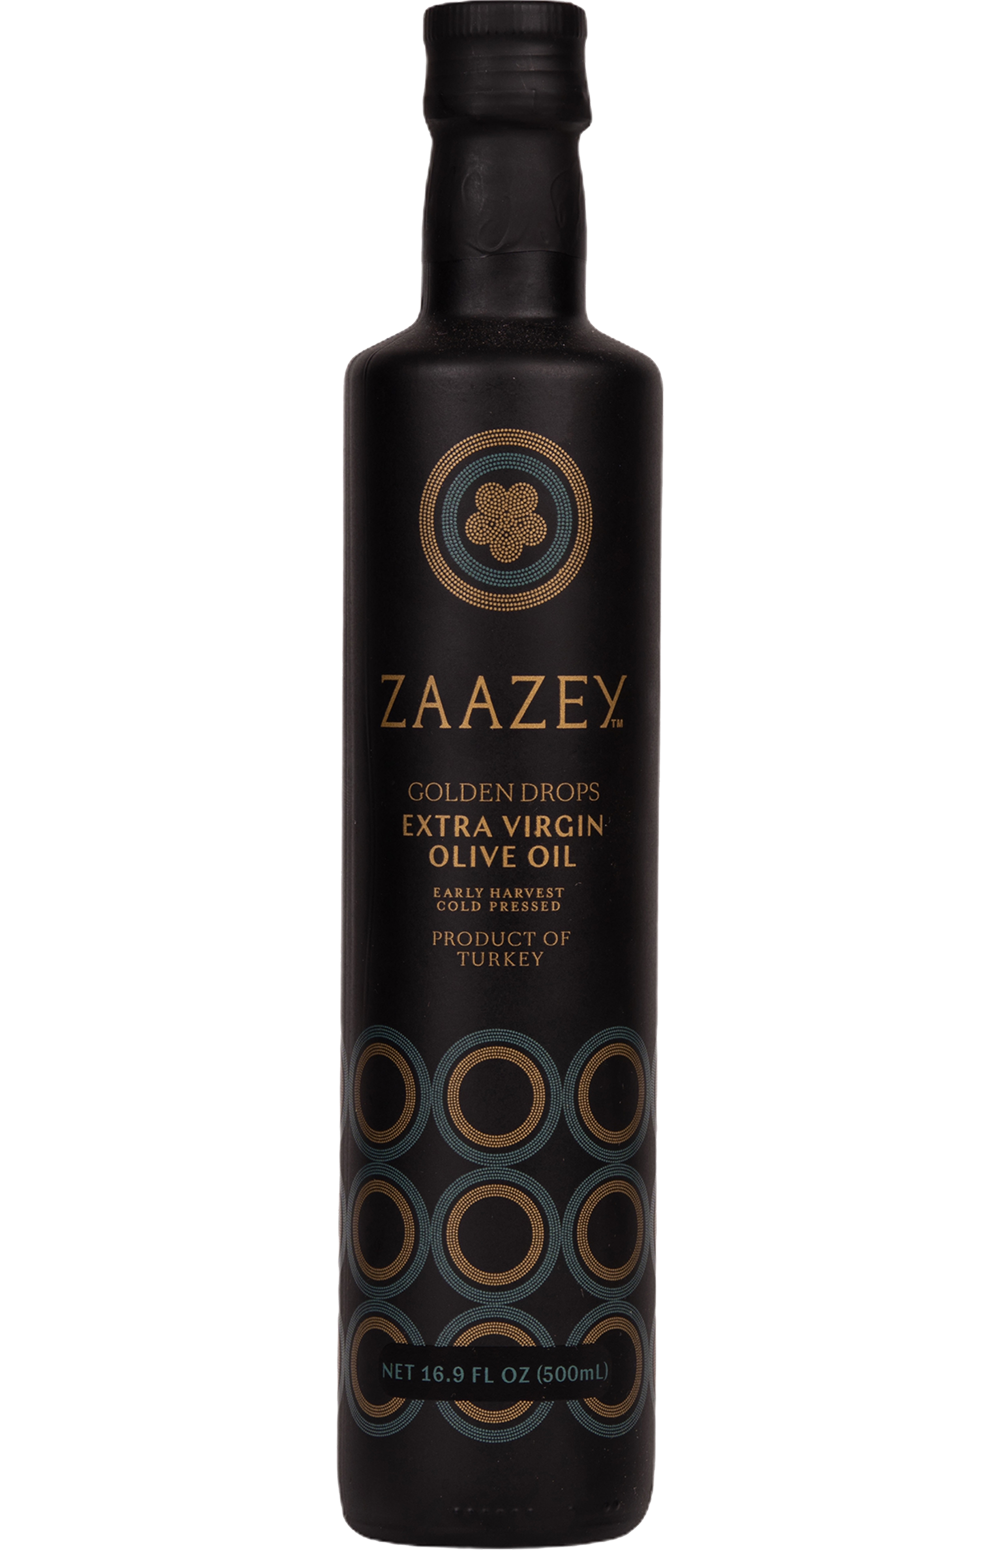 Zaazey Golden Drops